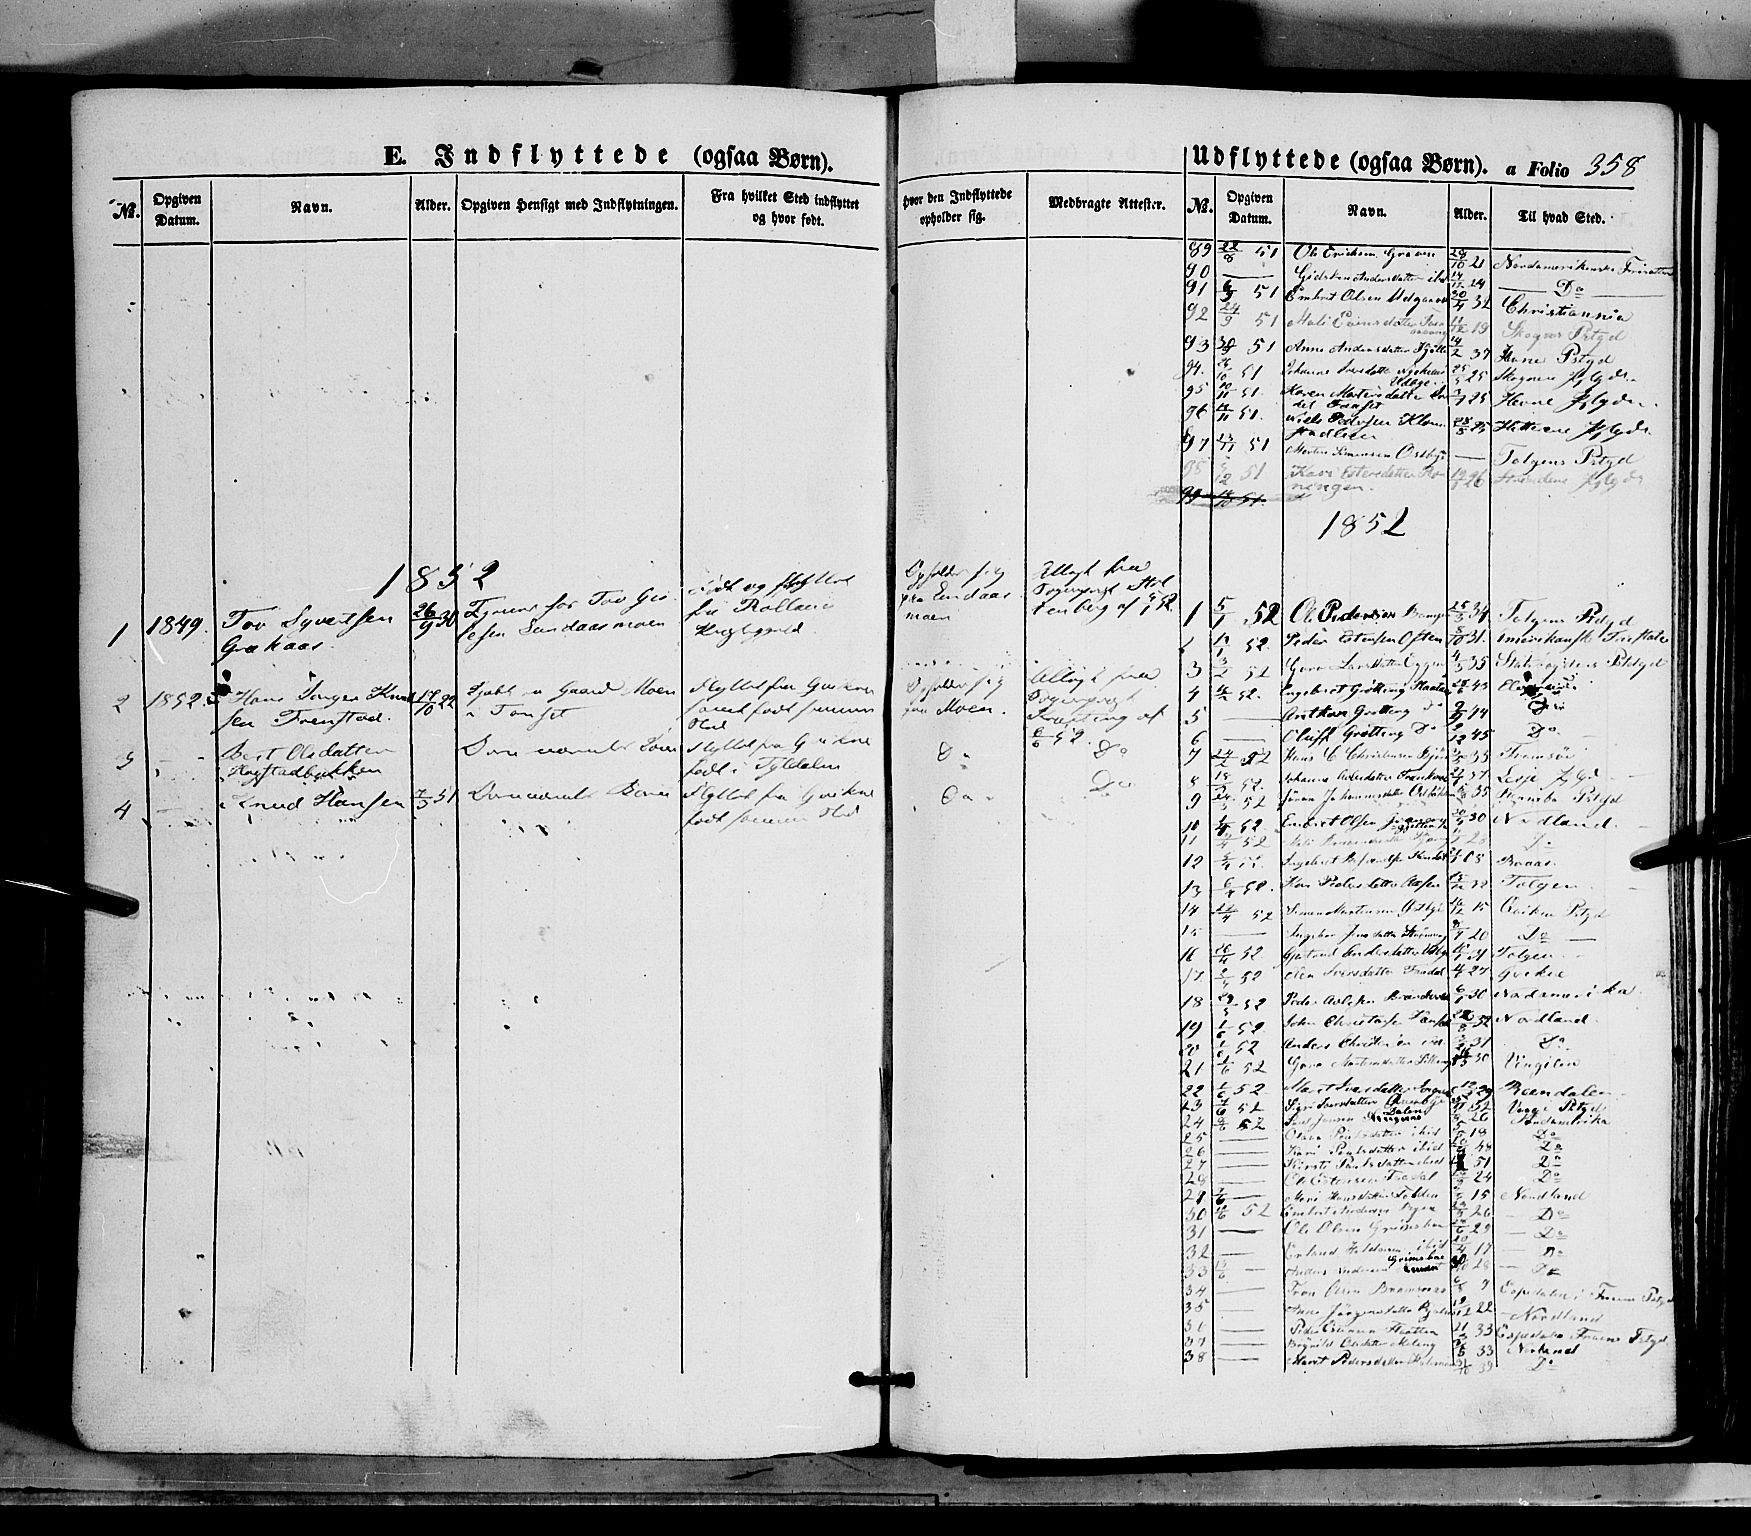 SAH, Tynset prestekontor, Ministerialbok nr. 20, 1848-1862, s. 358